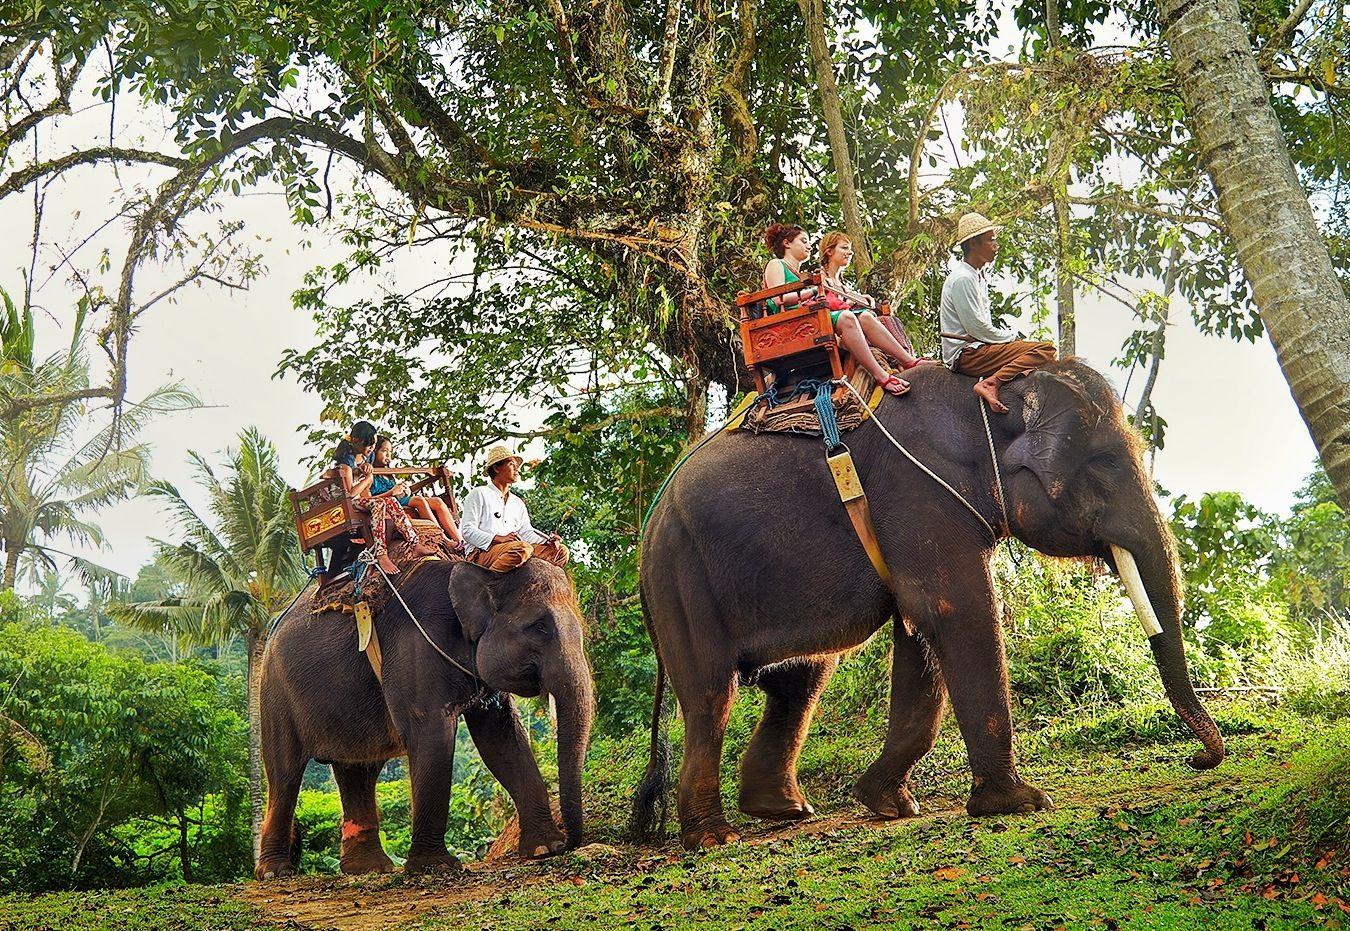 Balade elephant bali